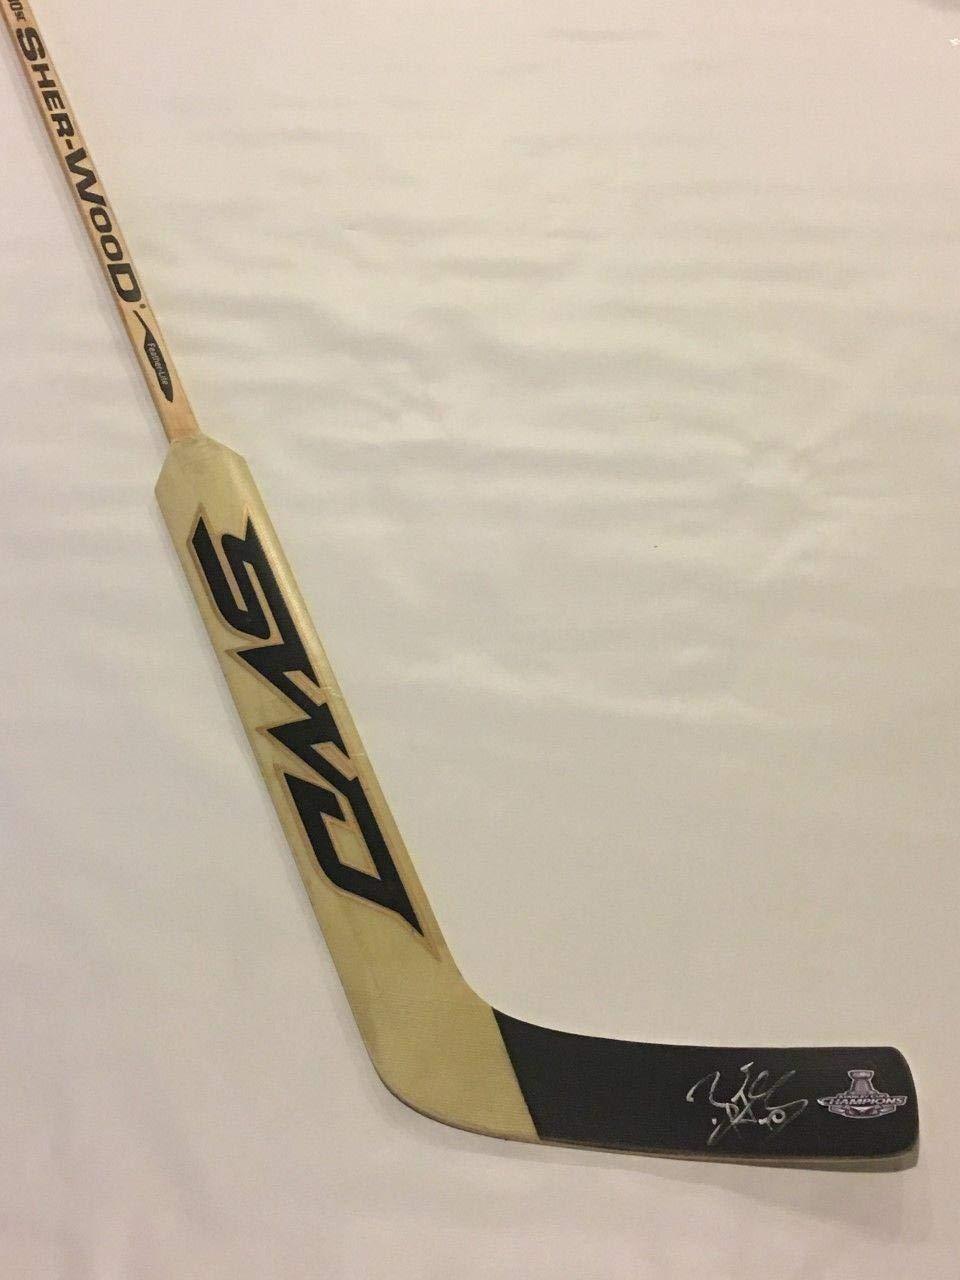 Braden Holtby Autographed Stick Goalie 2018 Stanley Cup Champions Autographed NHL Sticks